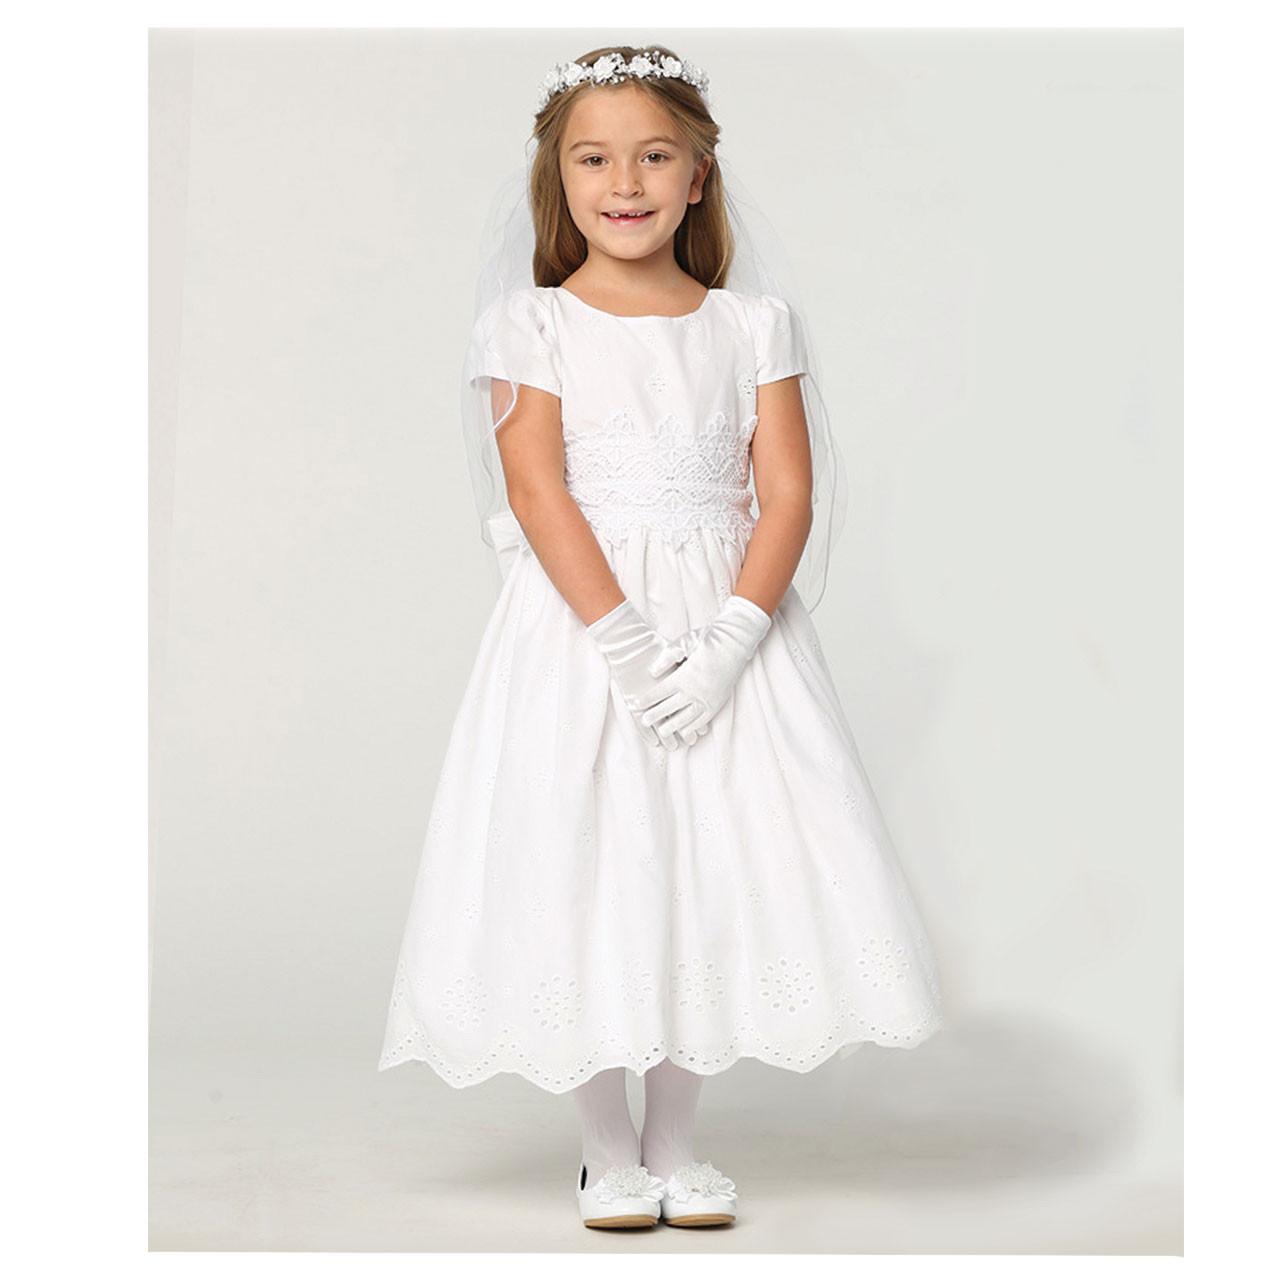 Jenny First Communion Dress